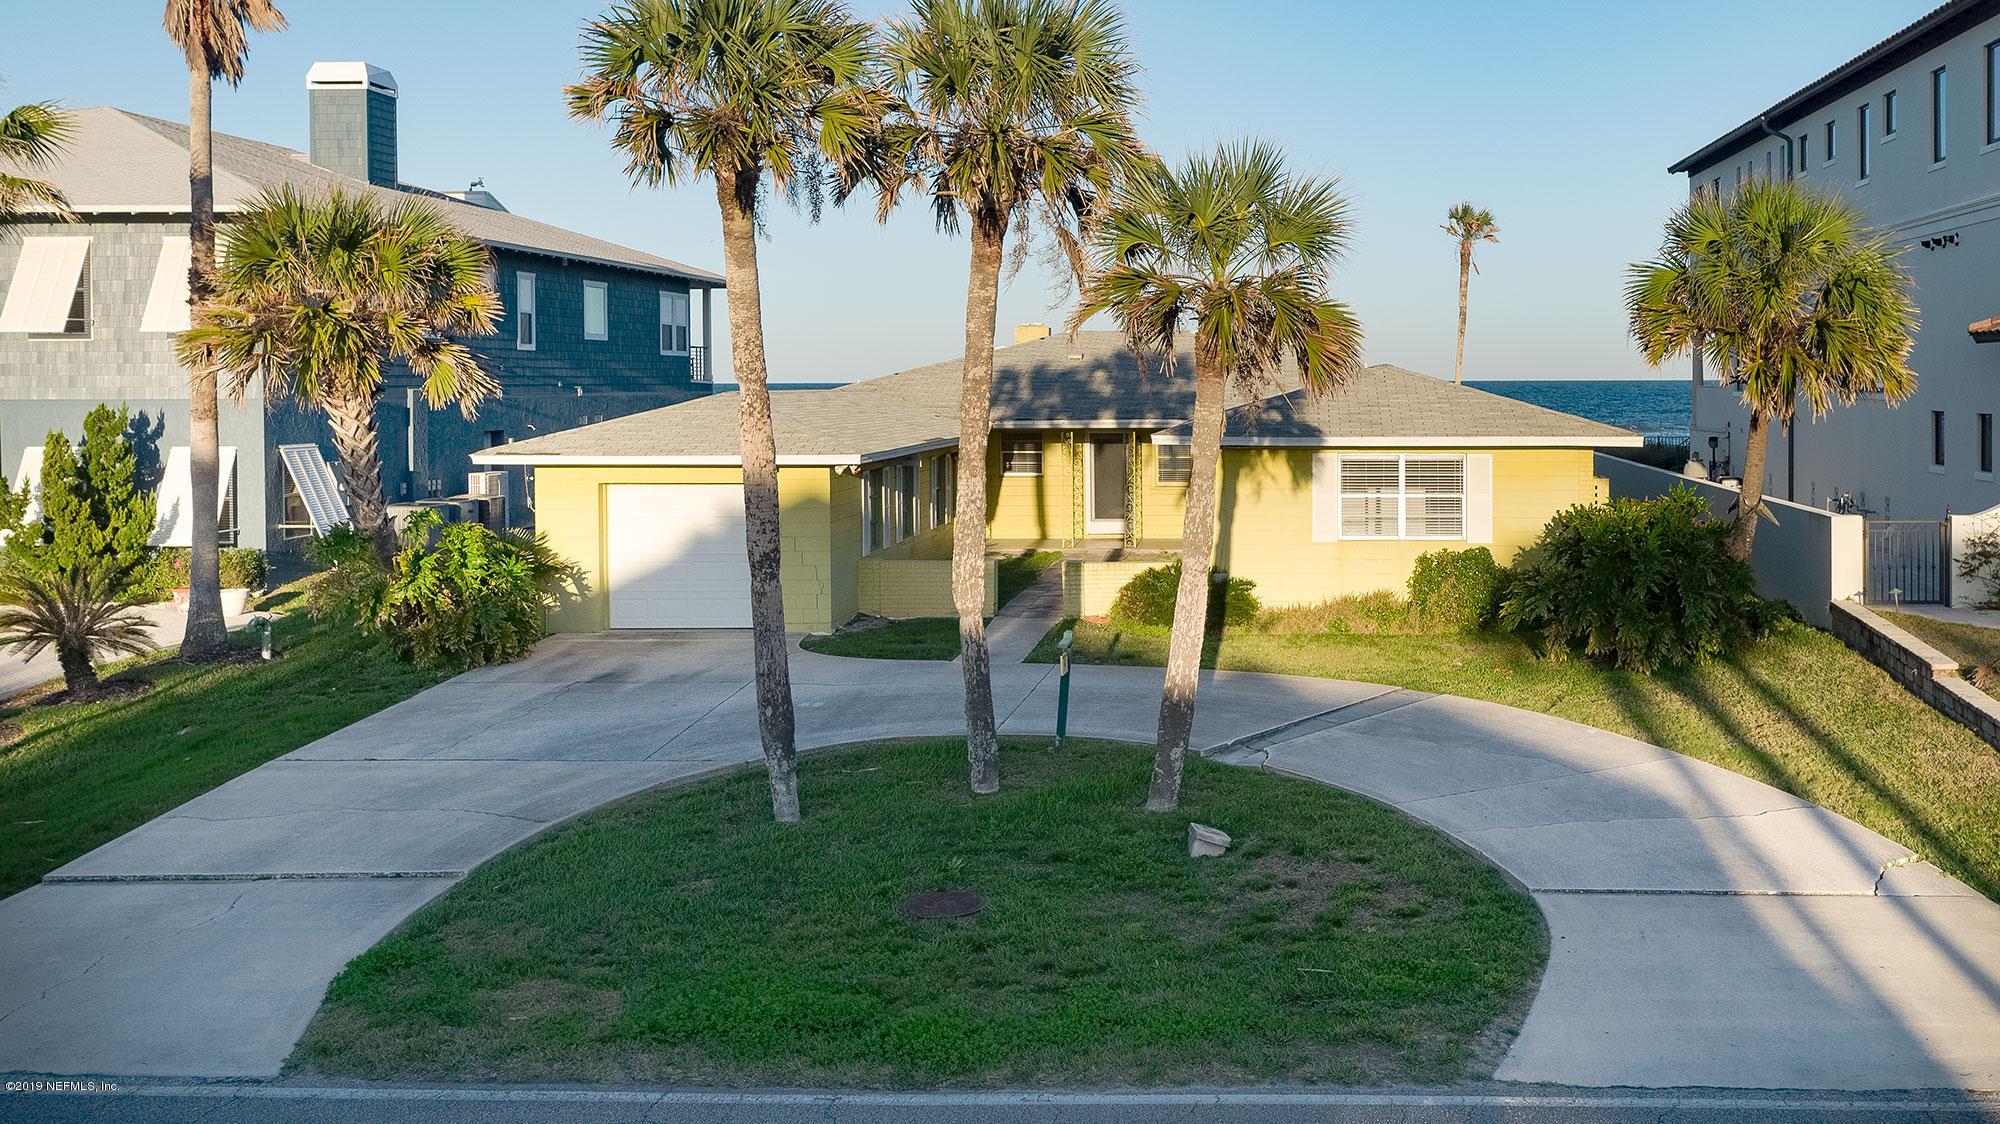 567 PONTE VEDRA, PONTE VEDRA BEACH, FLORIDA 32082, ,Vacant land,For sale,PONTE VEDRA,987197